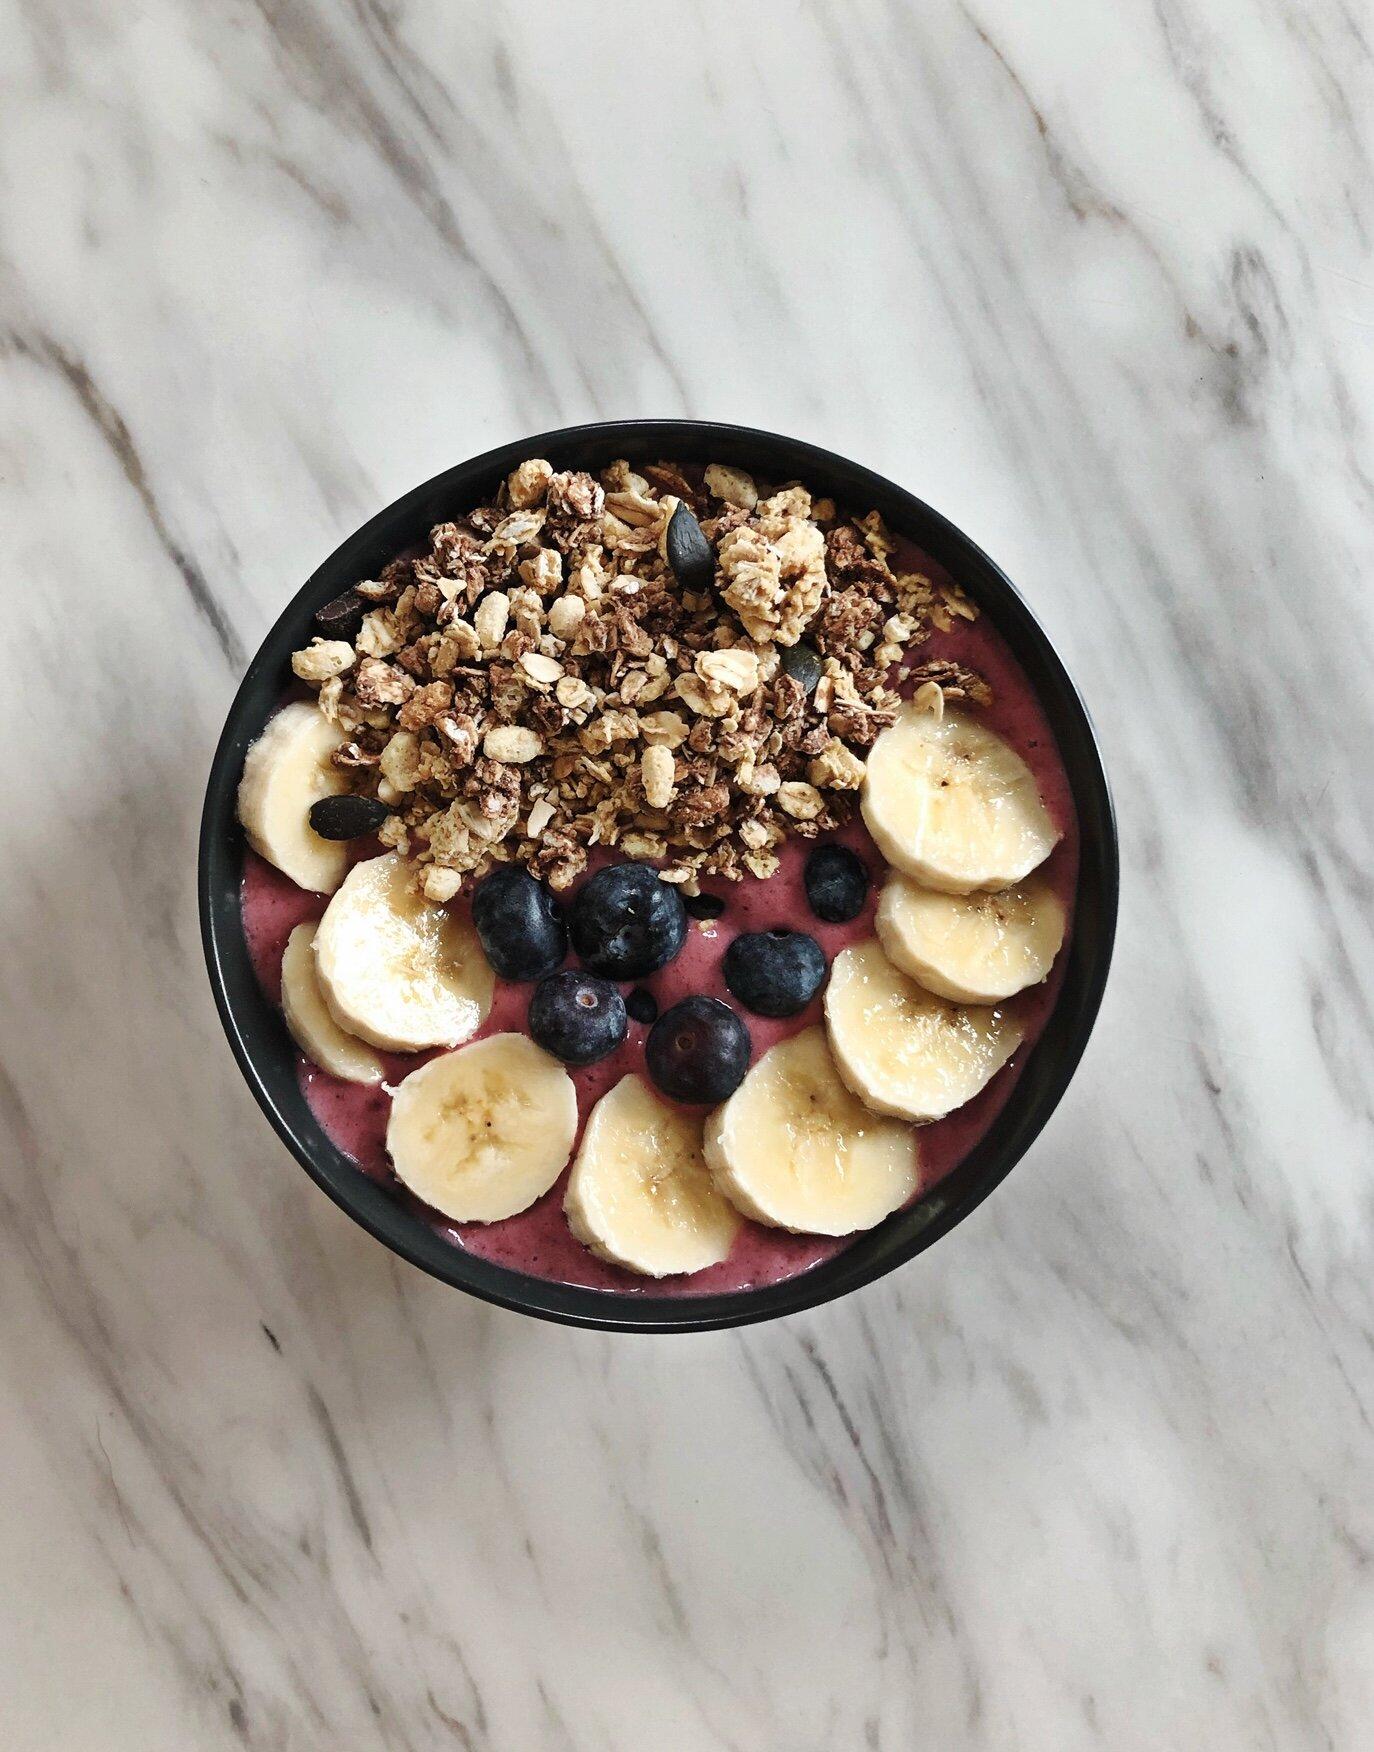 Vegan Berry and Banana Smoothie Bowl